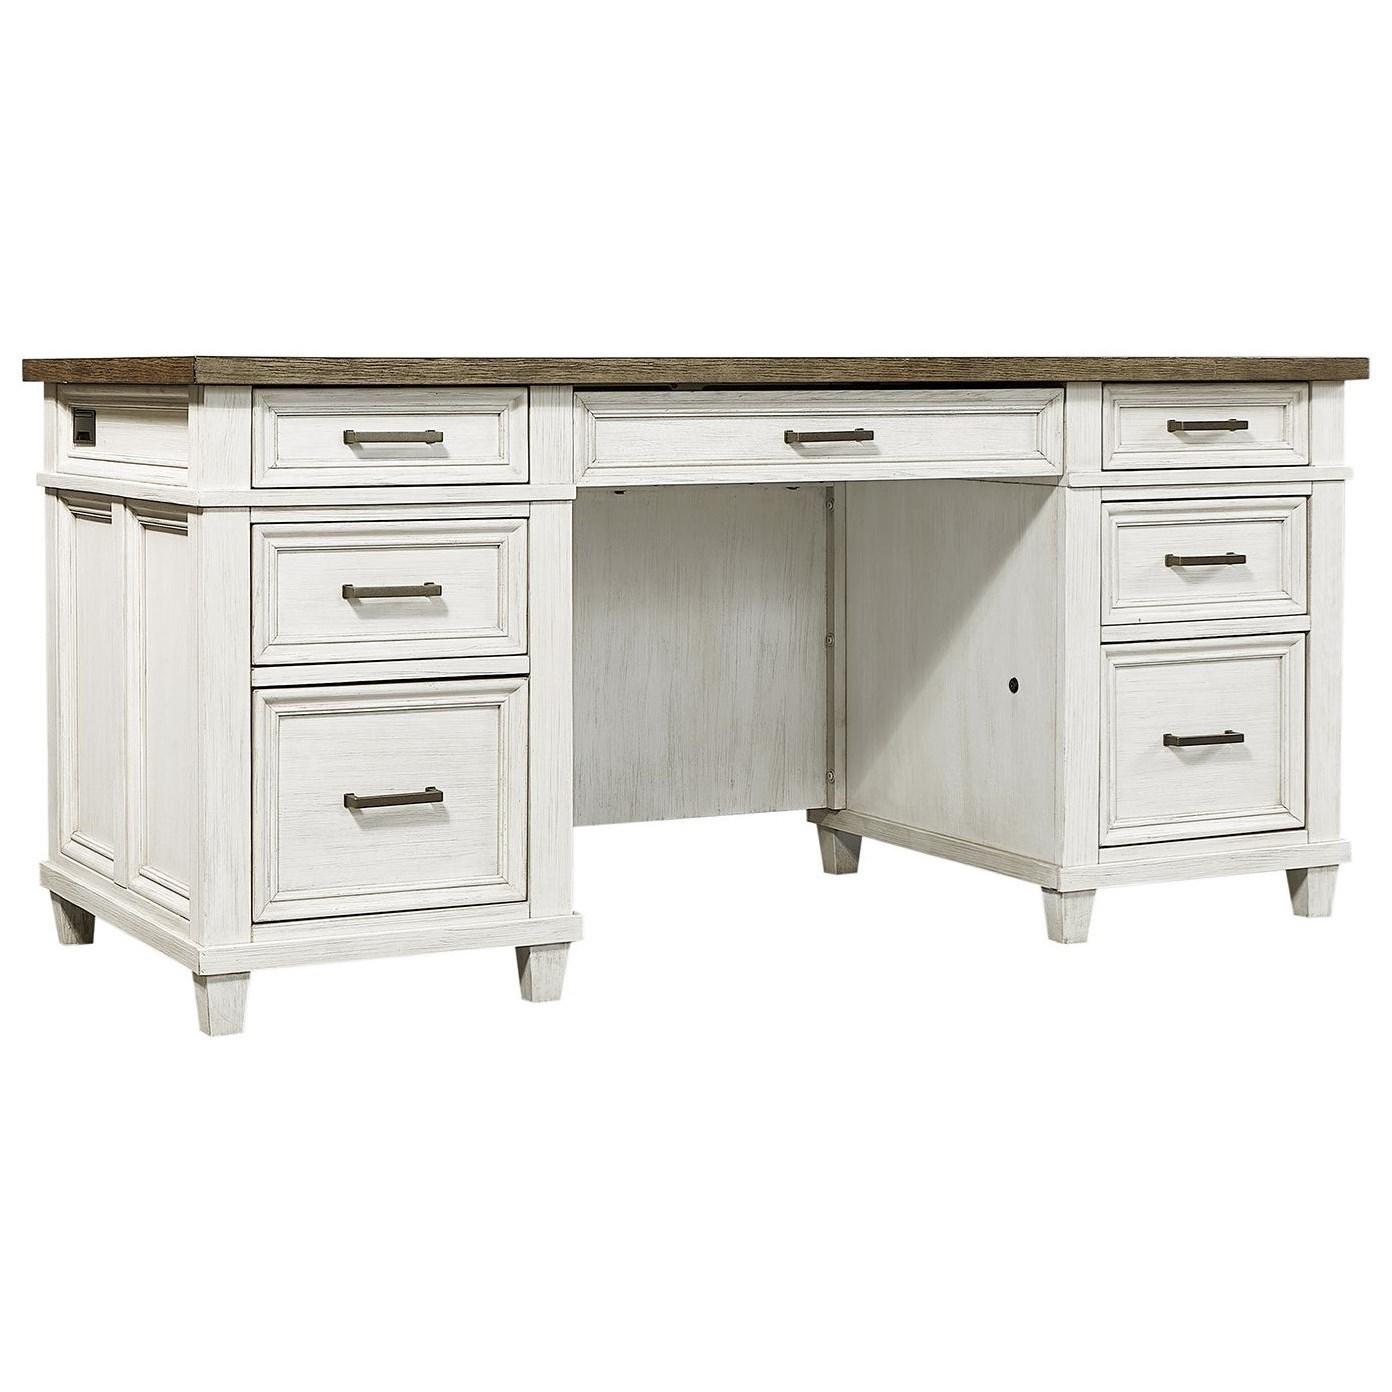 Caraway Executive Desk  by Aspenhome at Furniture Fair - North Carolina